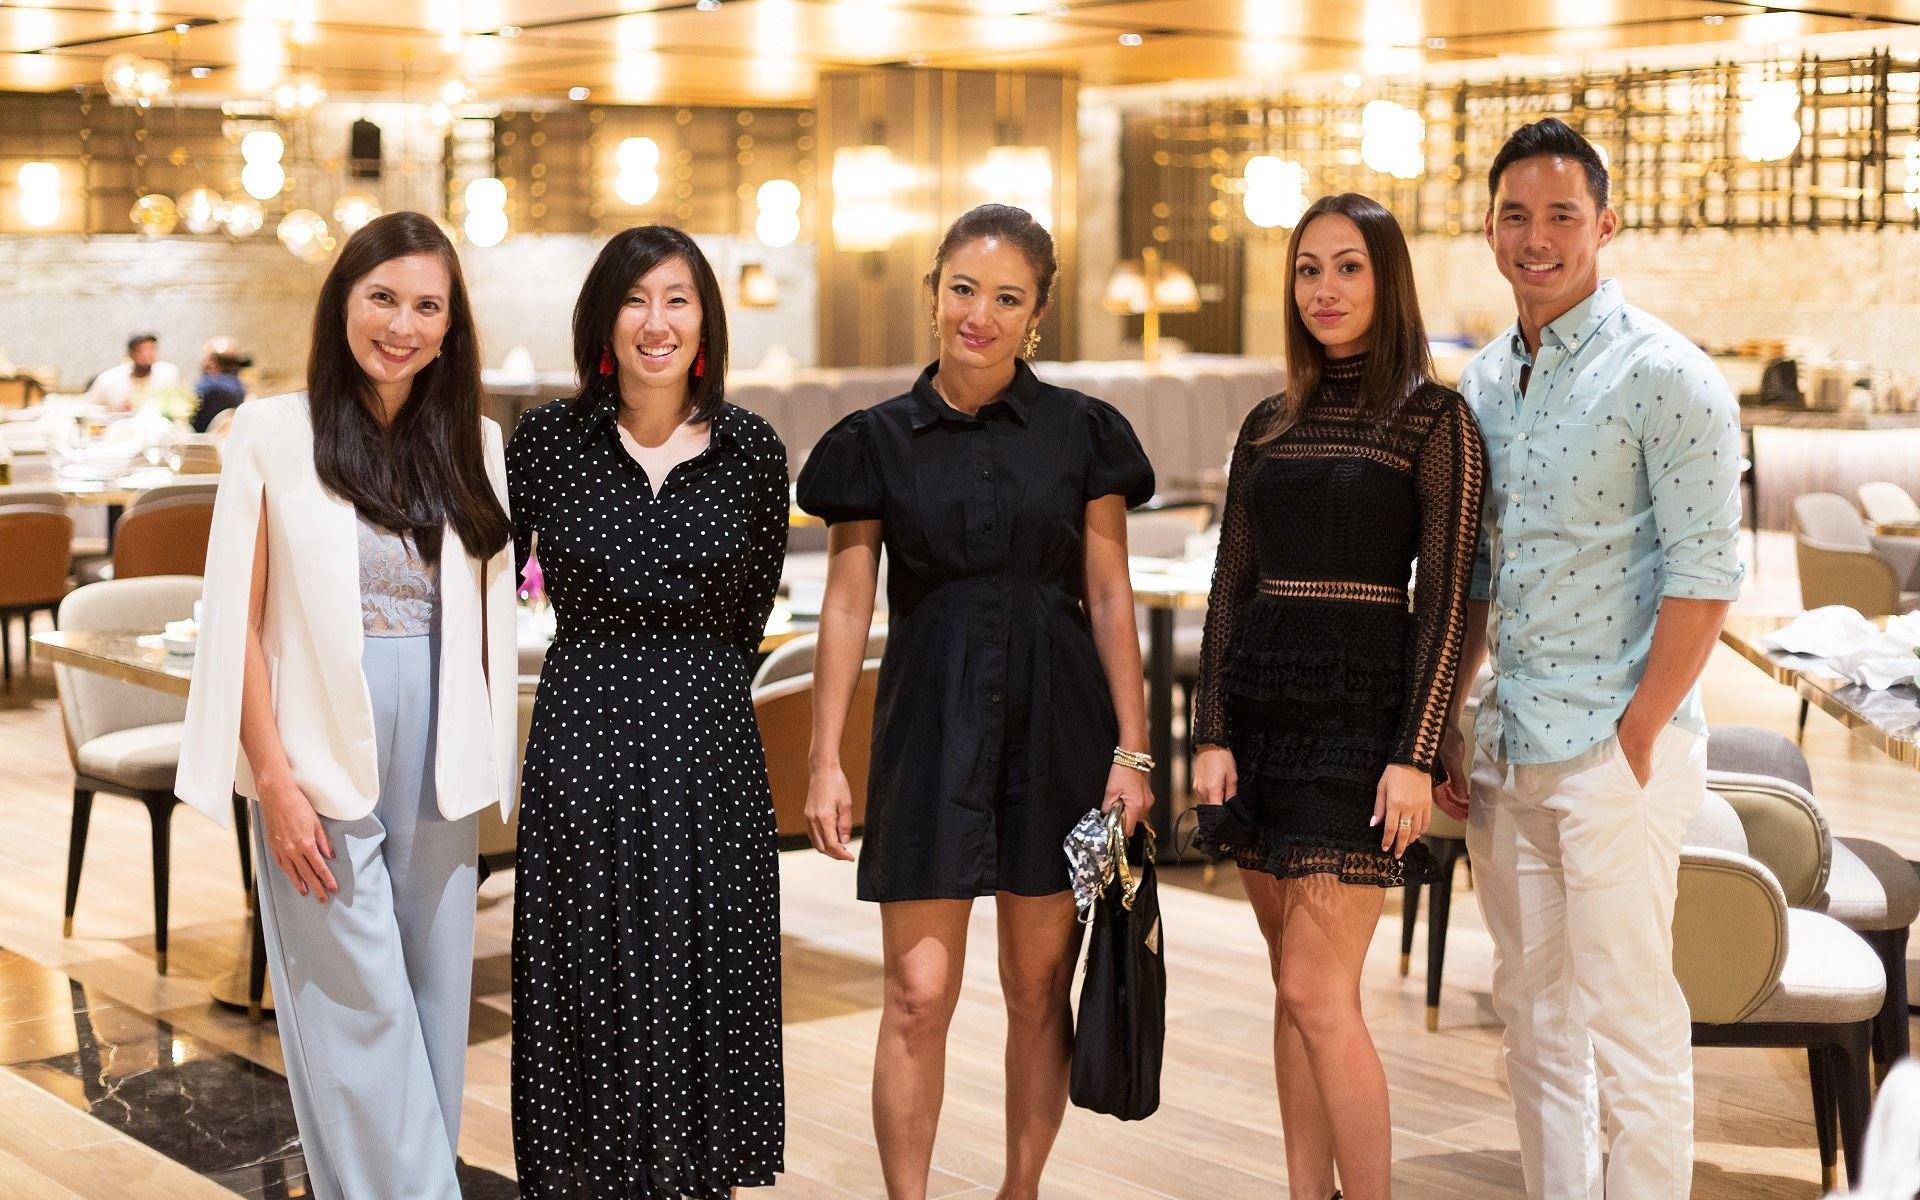 Geraldine Dreiser, Min Lim, Timmy Lim, Emilia Goh and Tan San Chuan